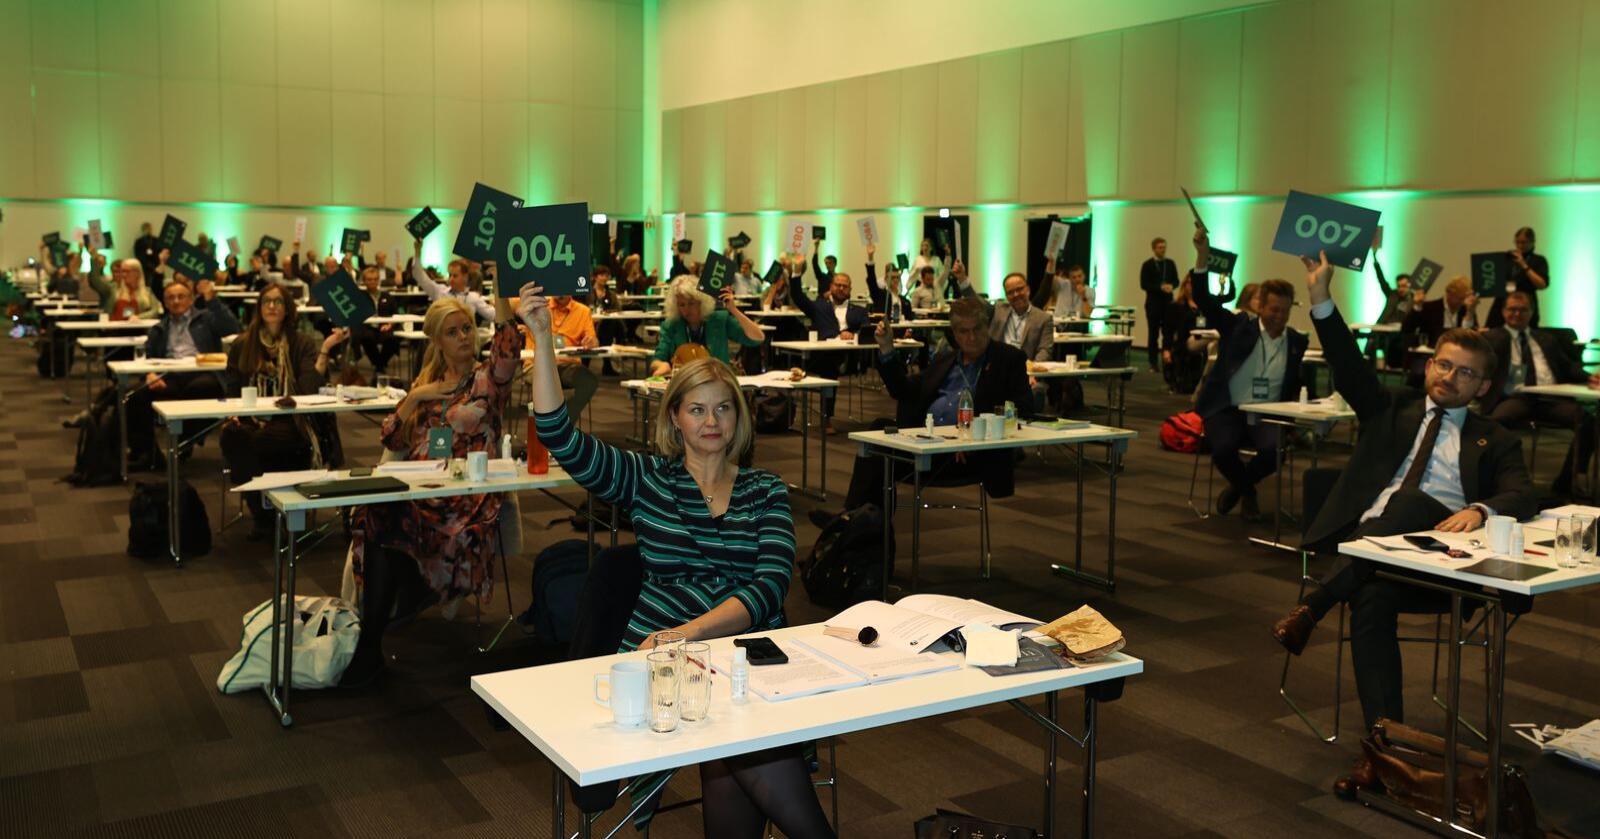 Venstre voterer over politiske saker på landsmøtet på Gardermoen. På fremre rad: Partileder Guro Melby og nestleder Sveinung Rotevatn. Foto: Geir Olsen / NTB